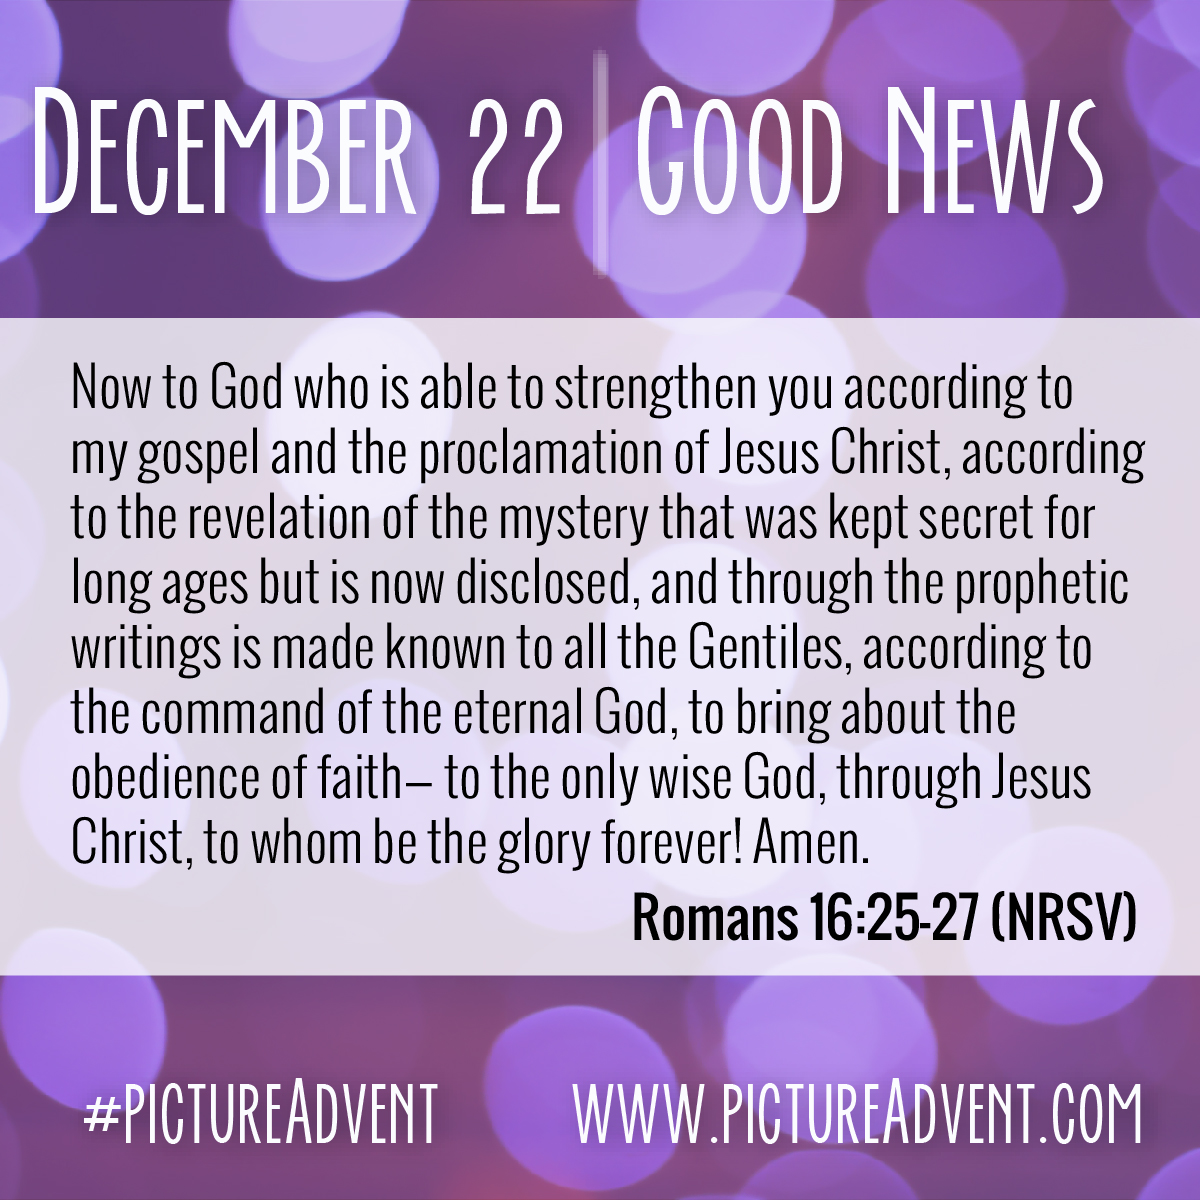 20 Dec 22 Good News-01.jpg